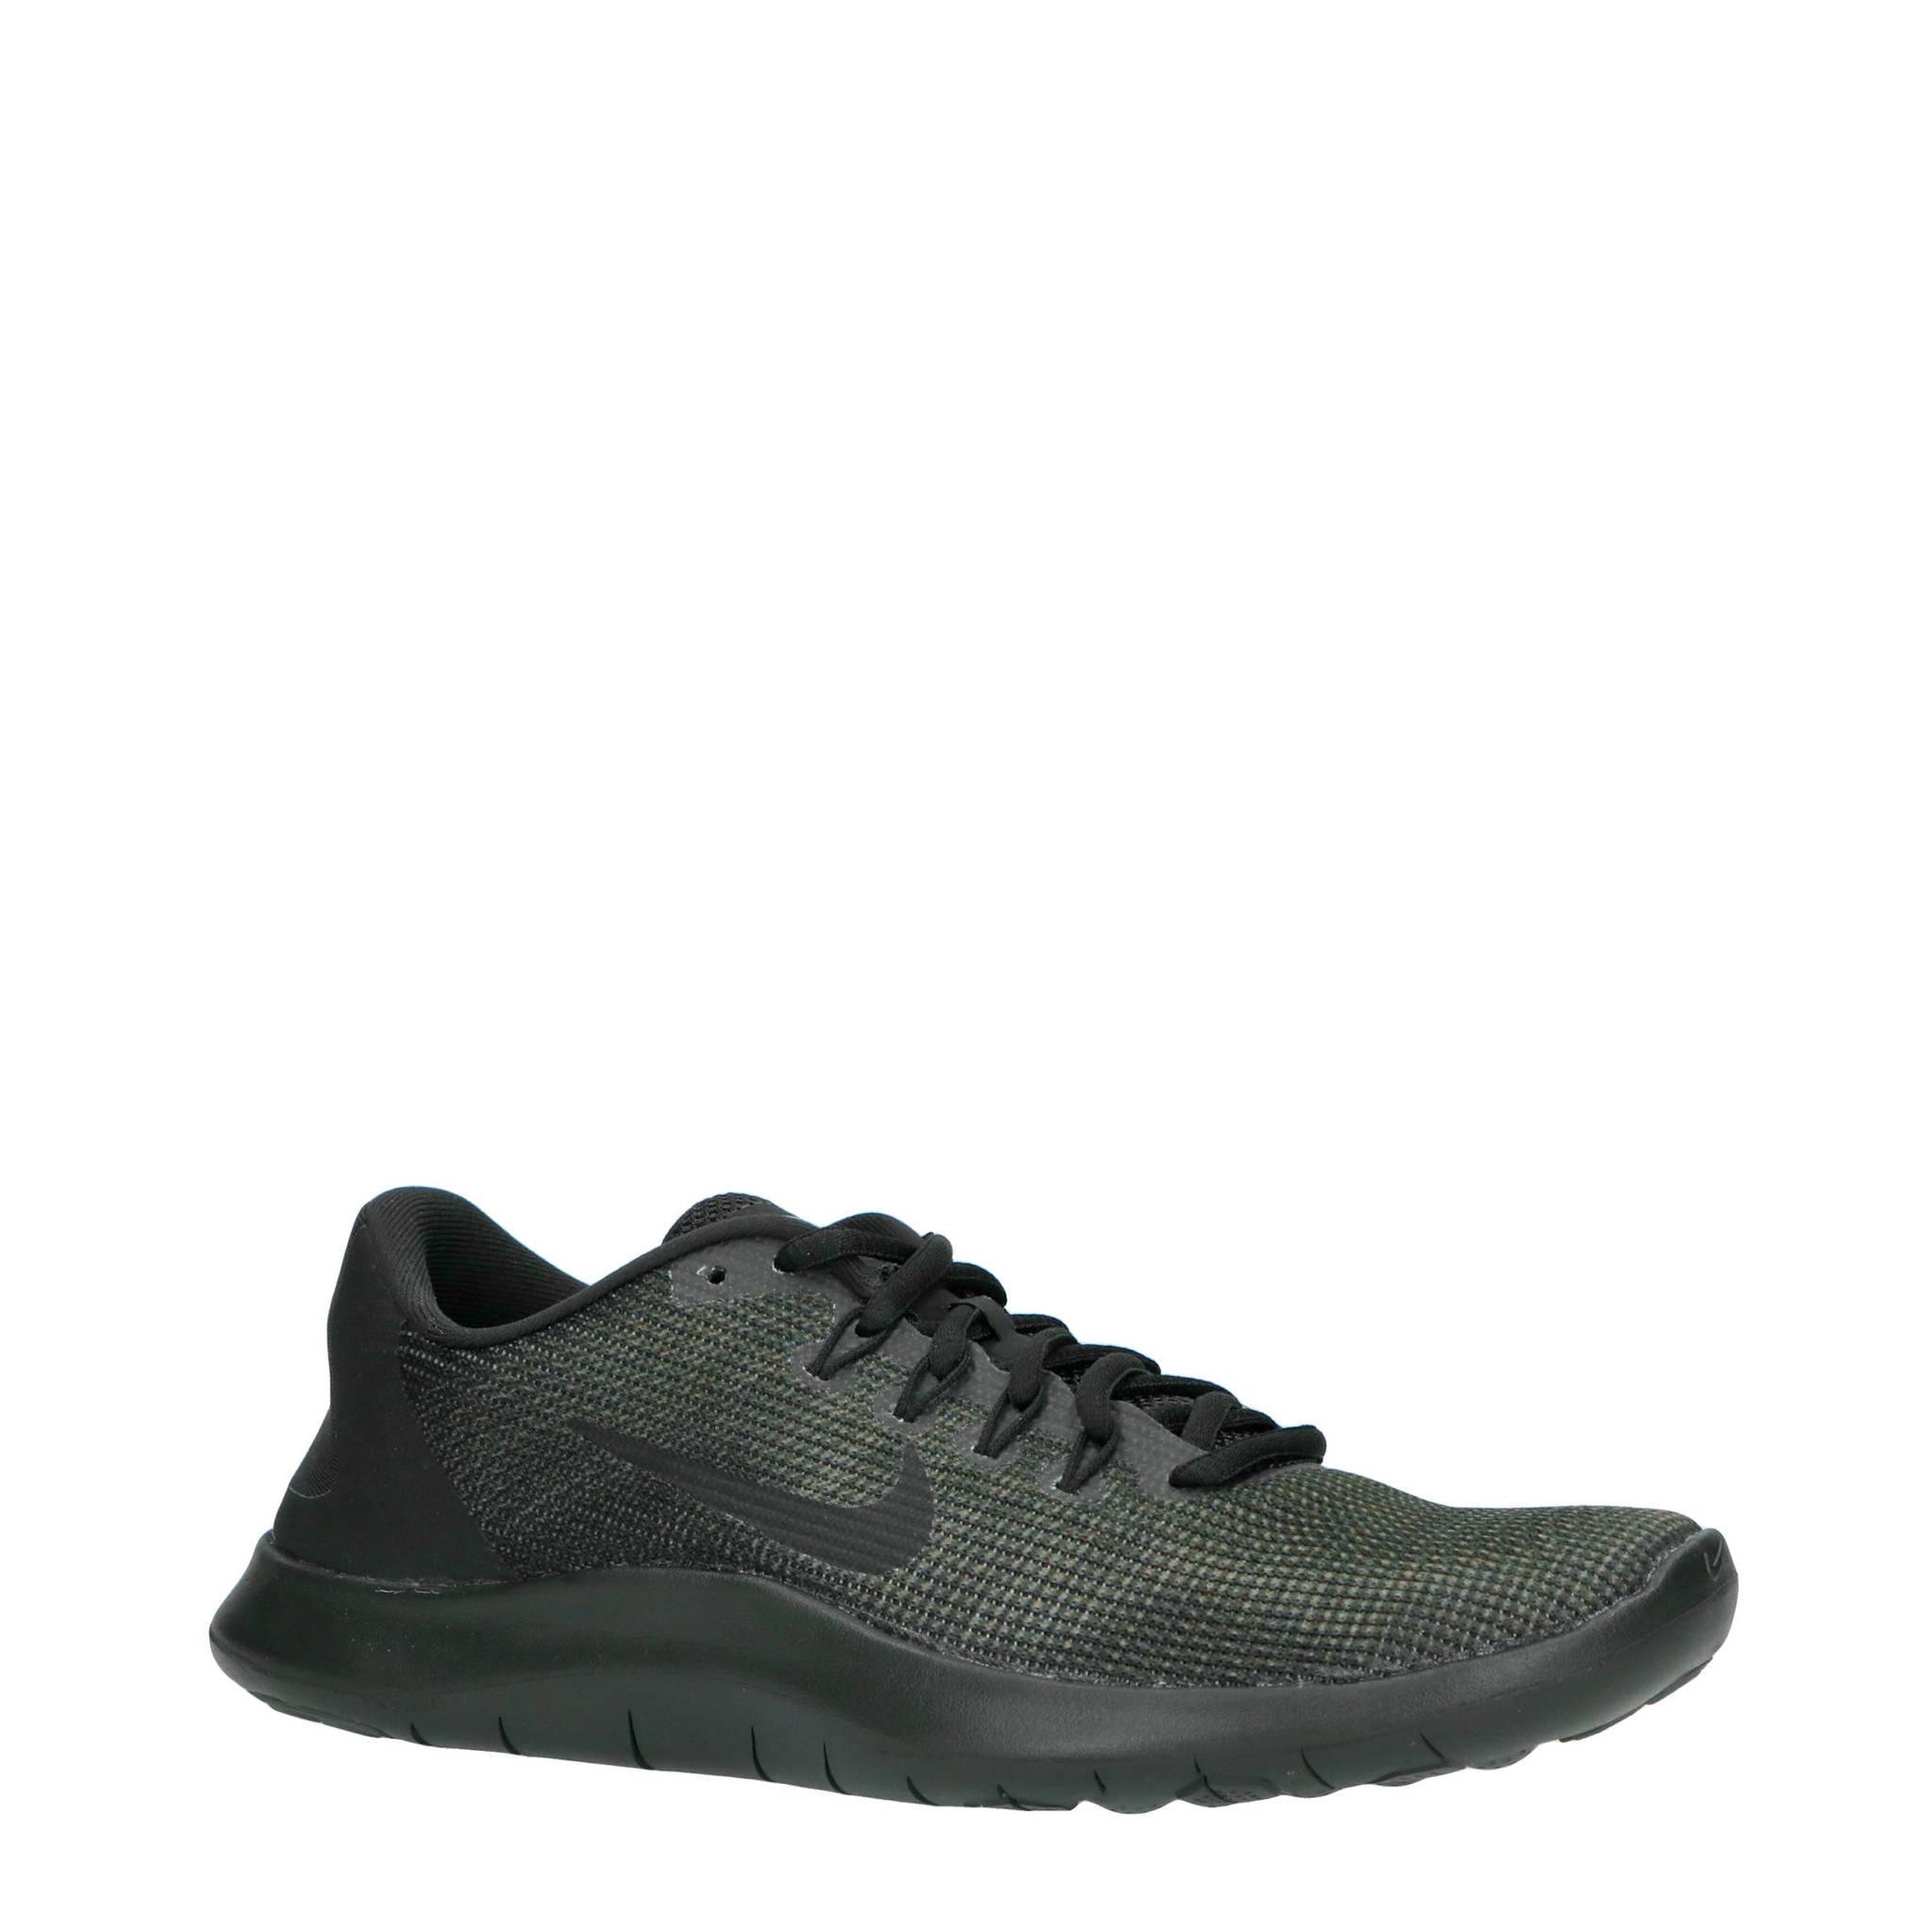 separation shoes 40952 4a2c8 Nike Flex 2018 RN hardloopschoenen zwartgrijs  wehkamp